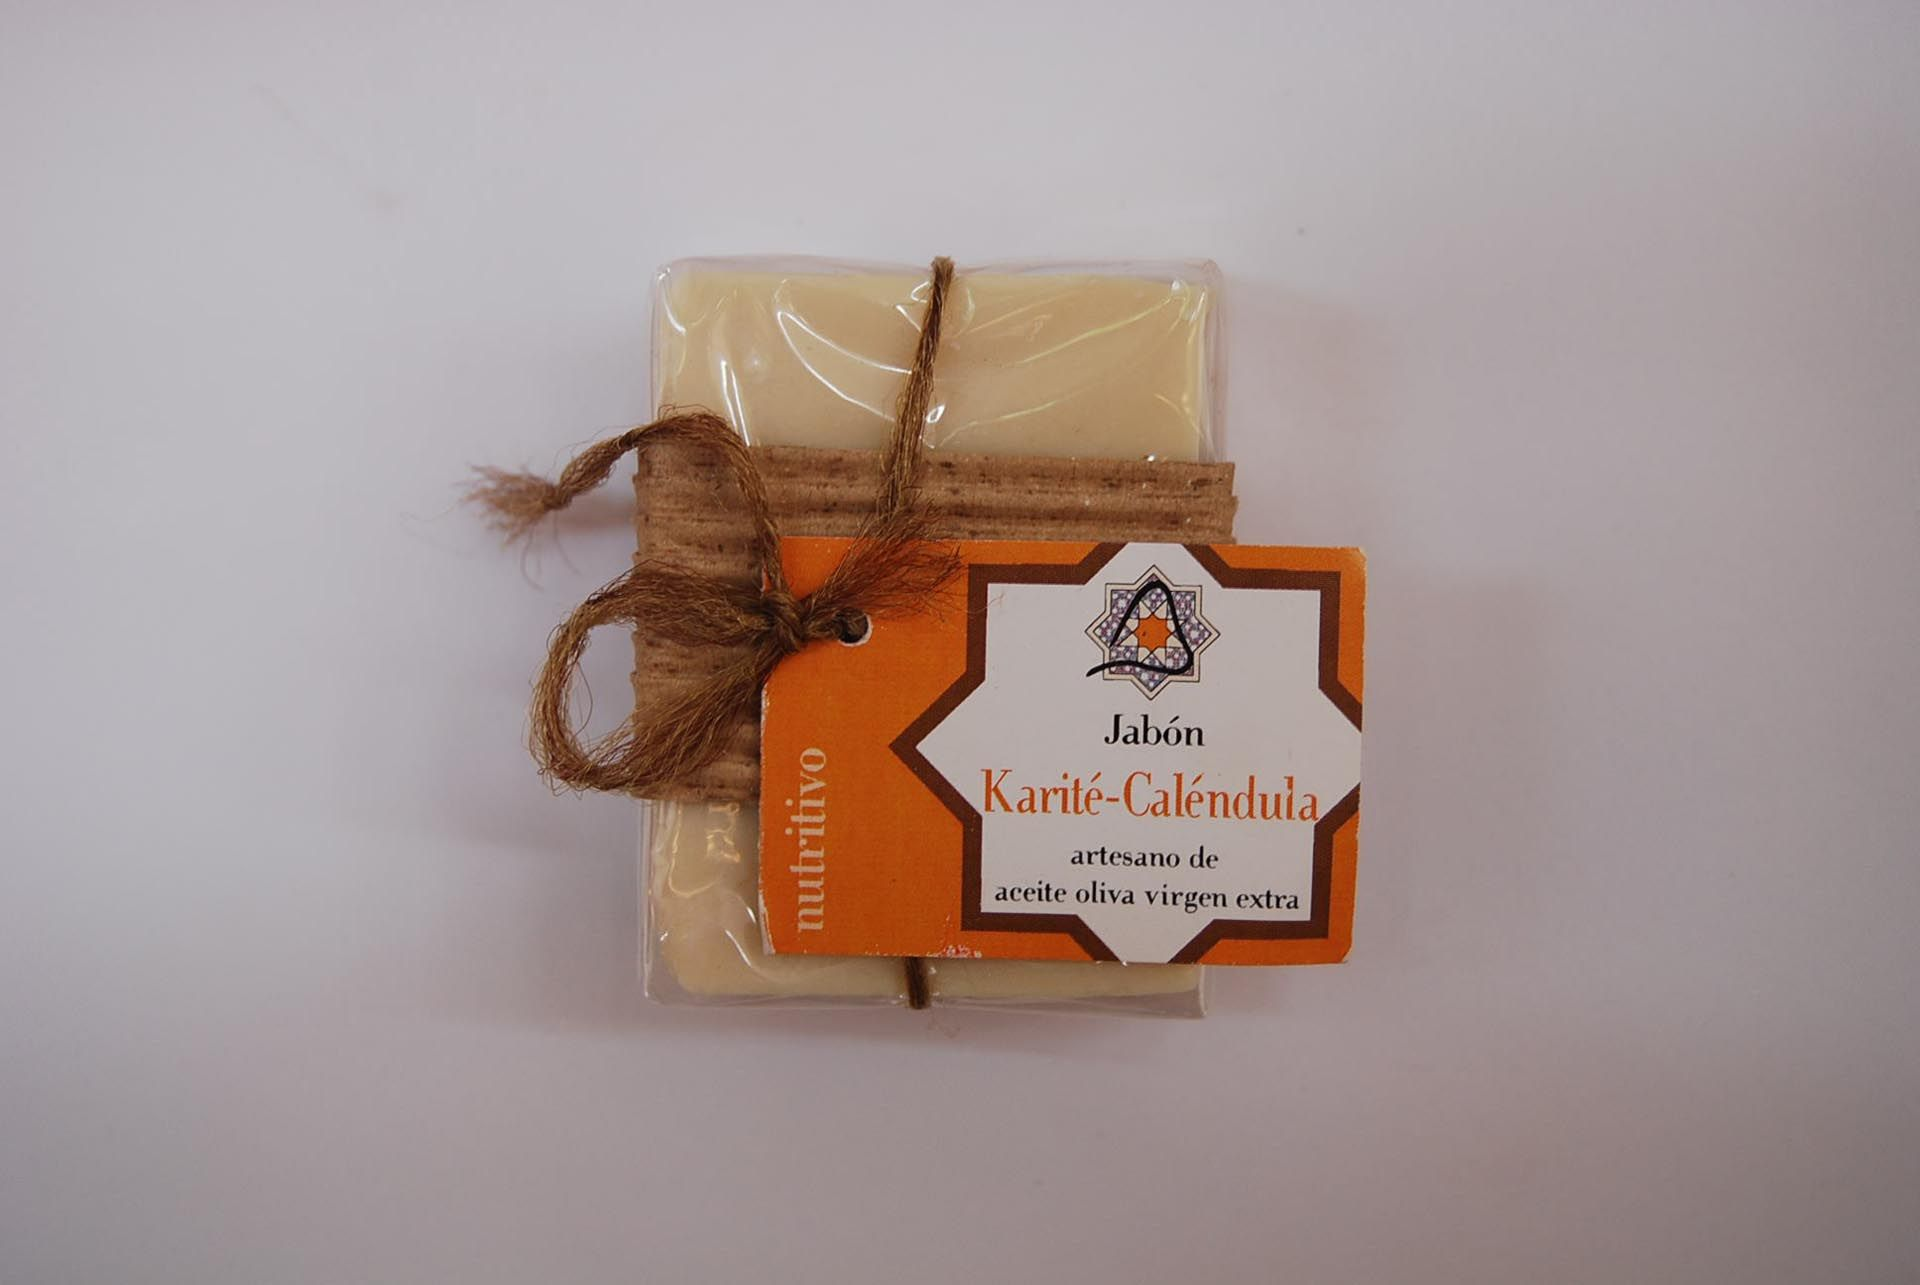 Jabón artesano de karité y caléndula: Productos de Arahí